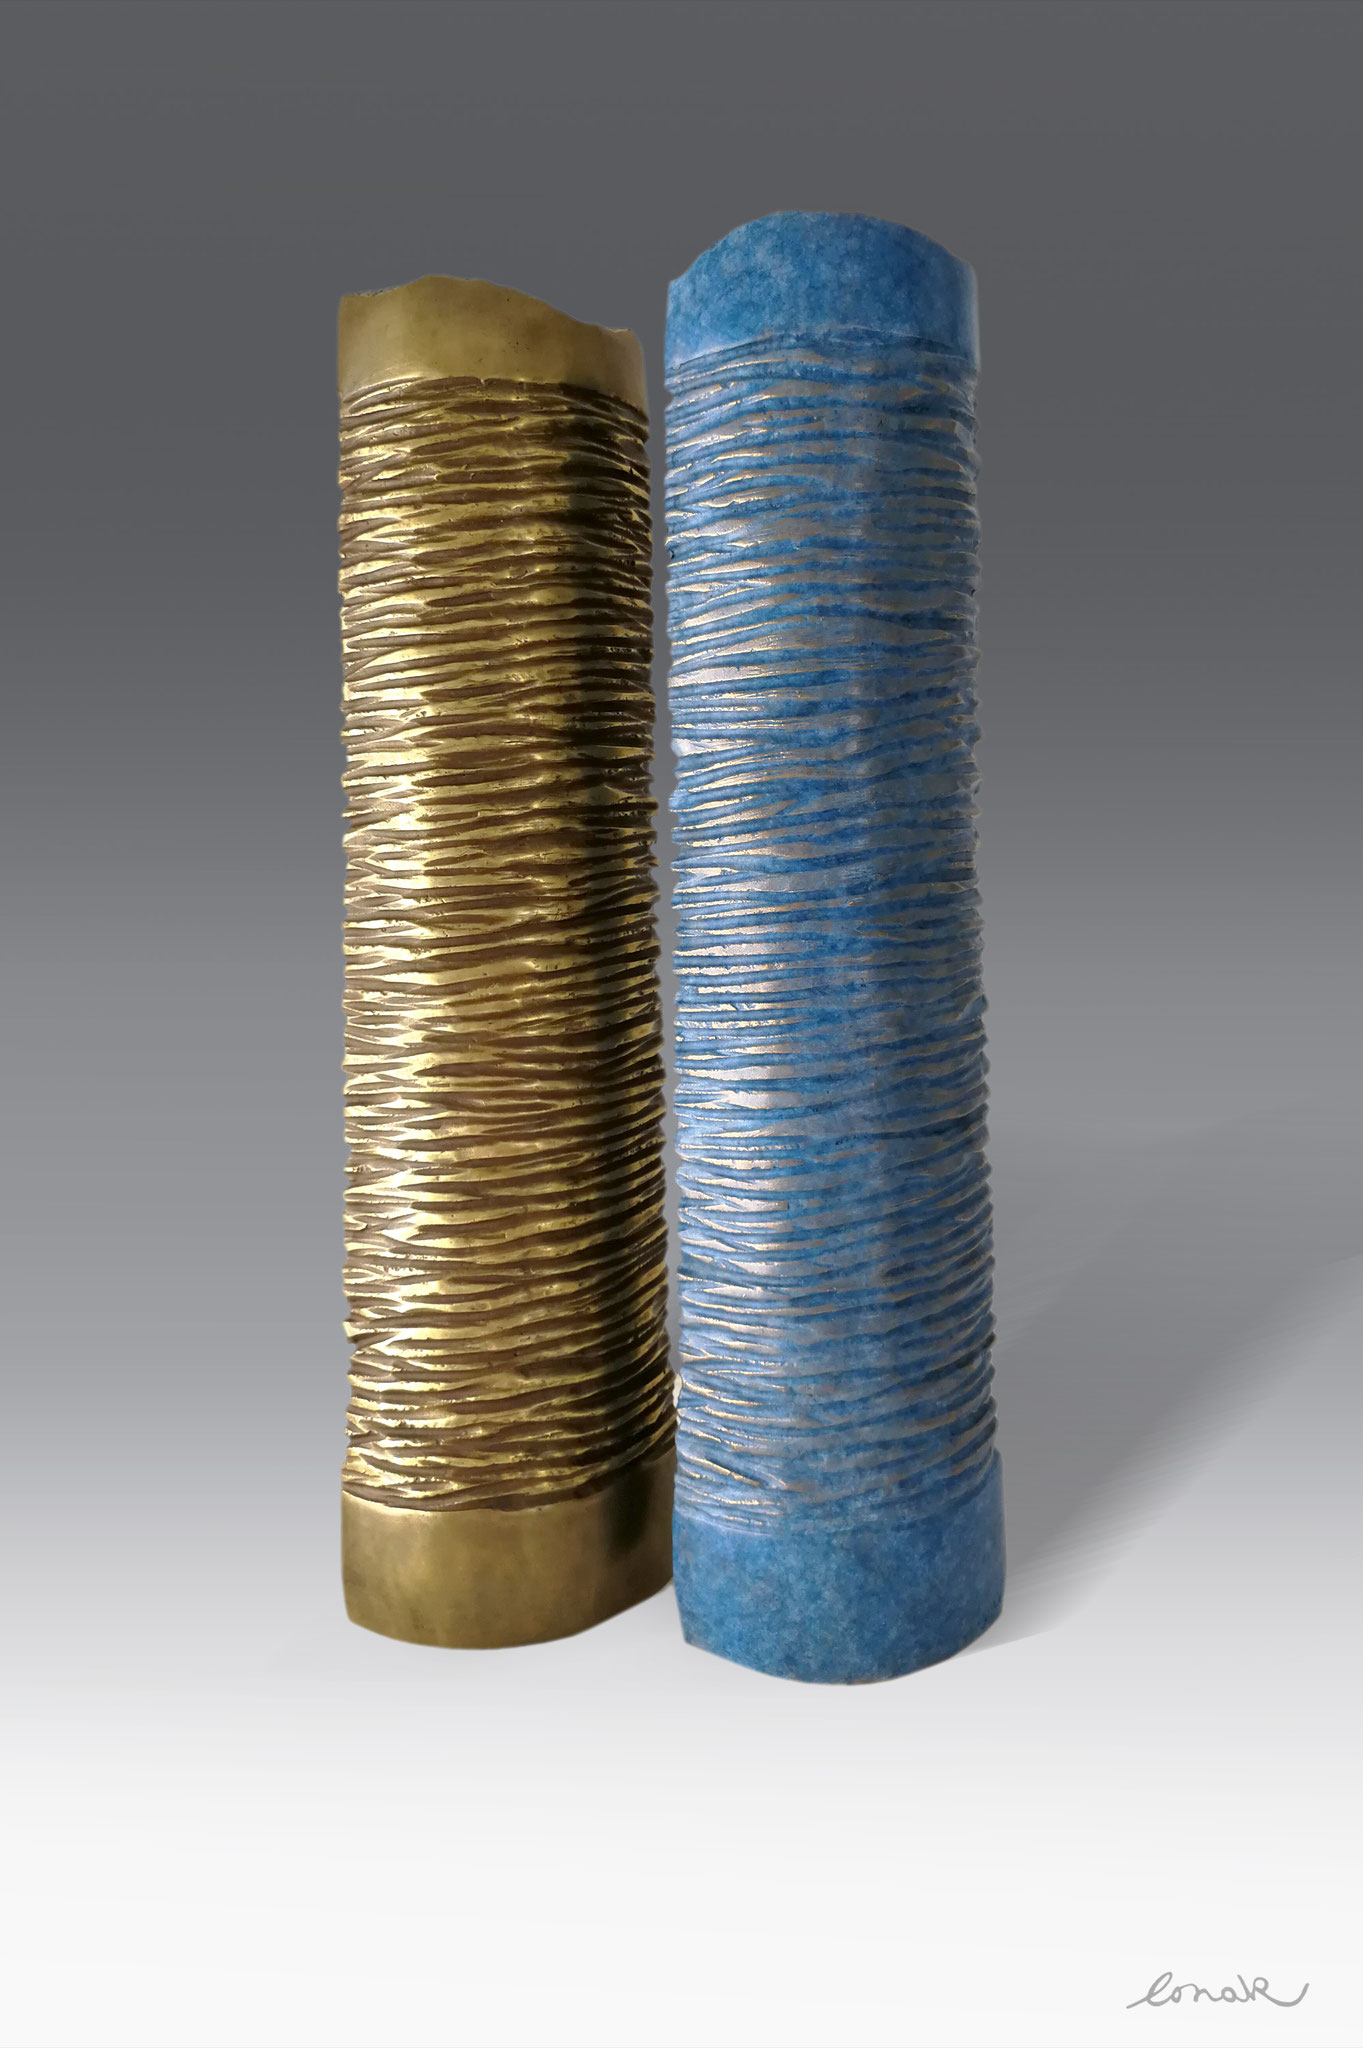 """Totem"" - bronze - 10x6x39cm (2 pieces)"